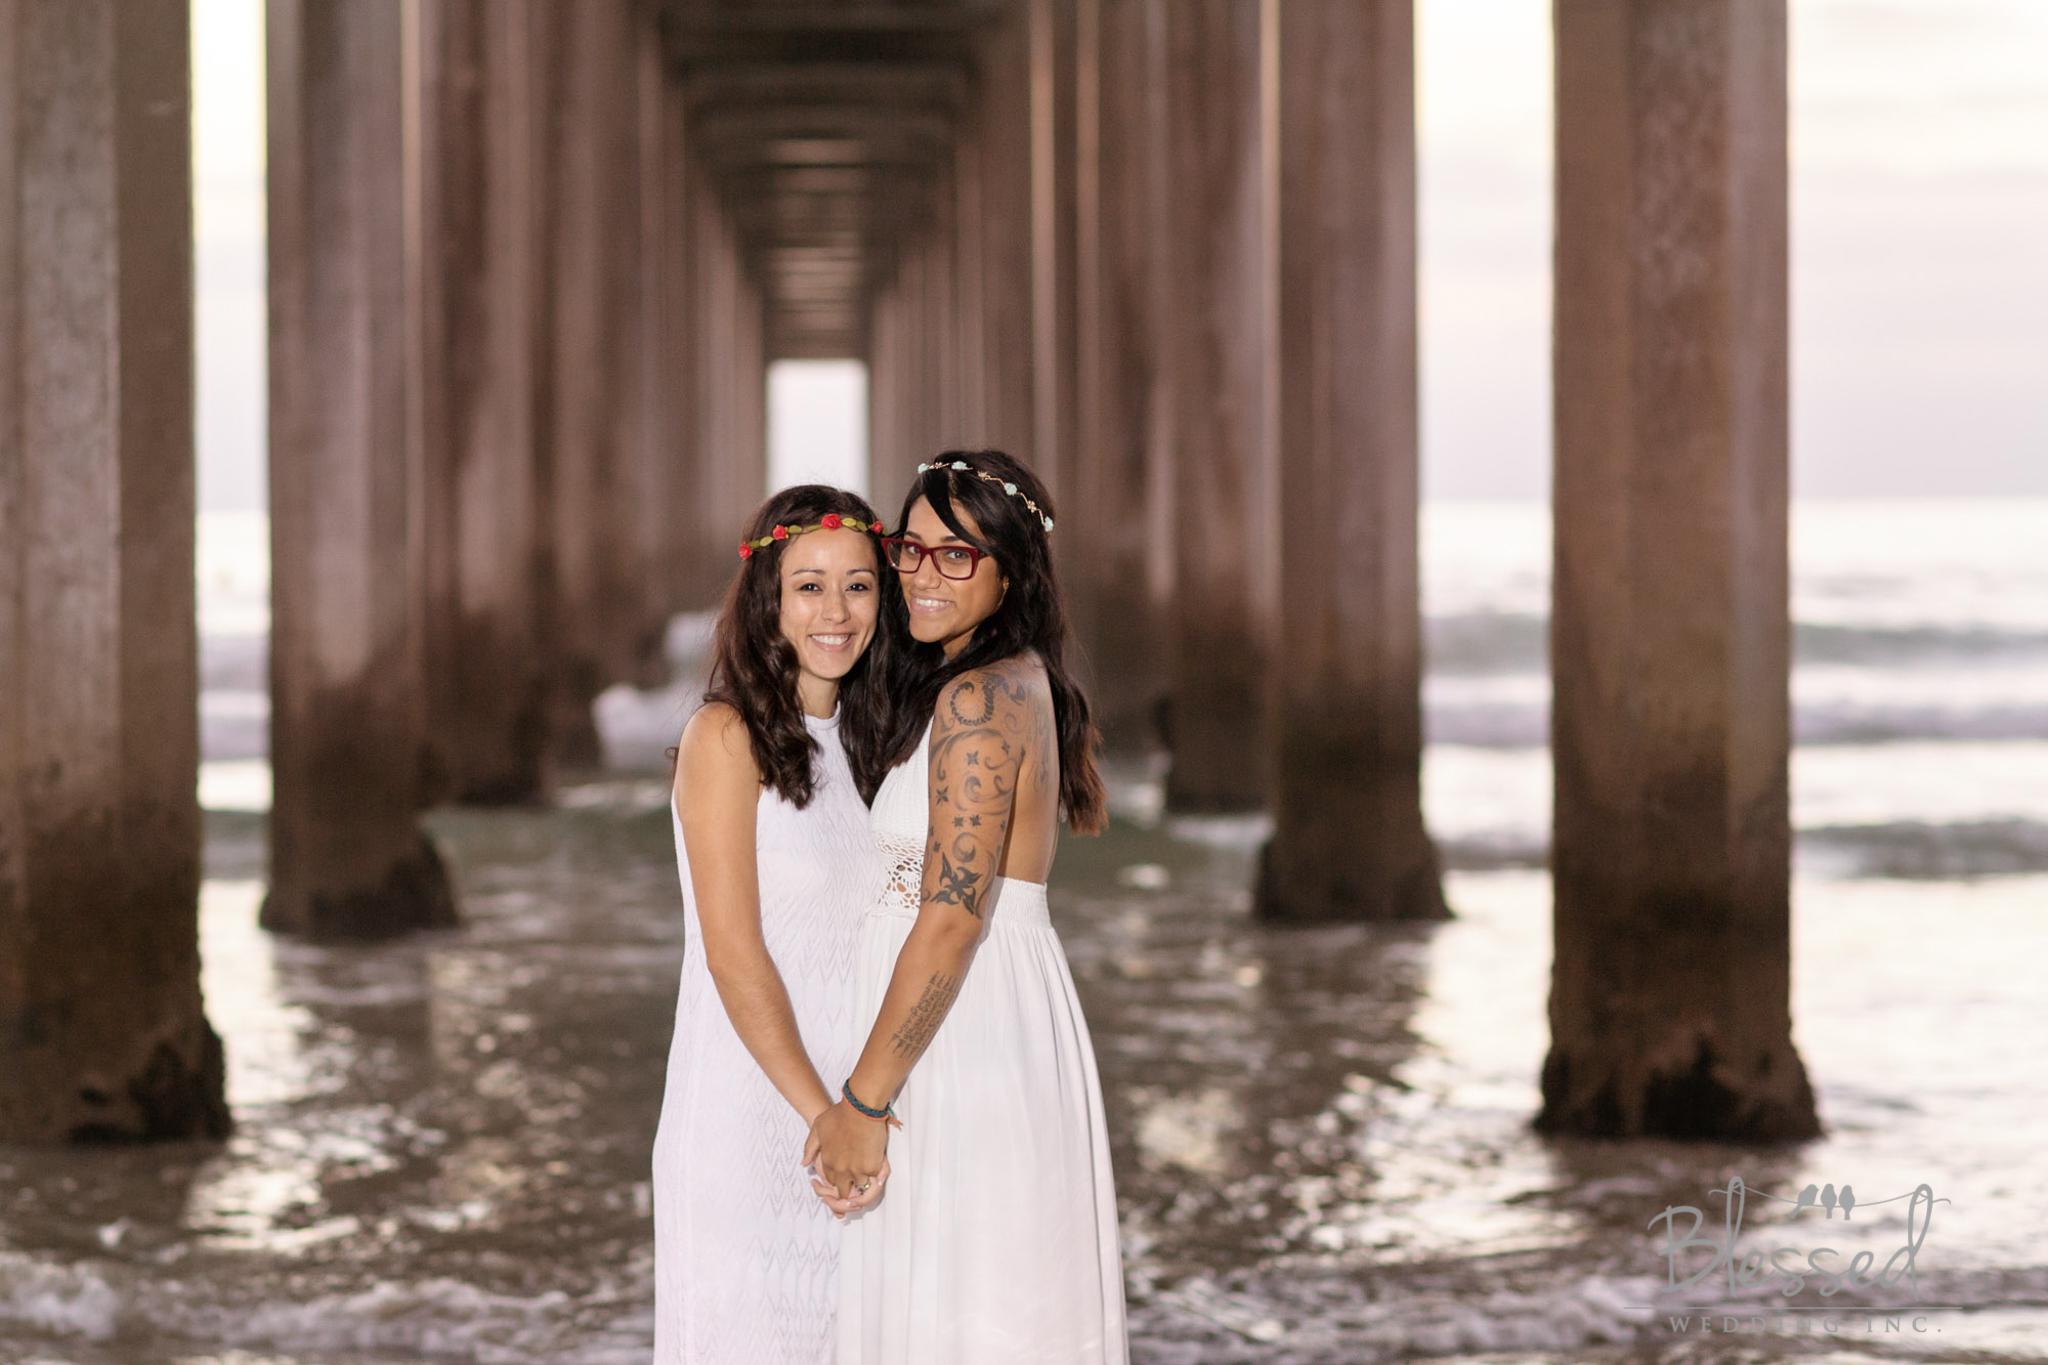 La Jolla Beach Engagement Session by San Diego Wedding Photographers Blessed Wedding-58.jpg